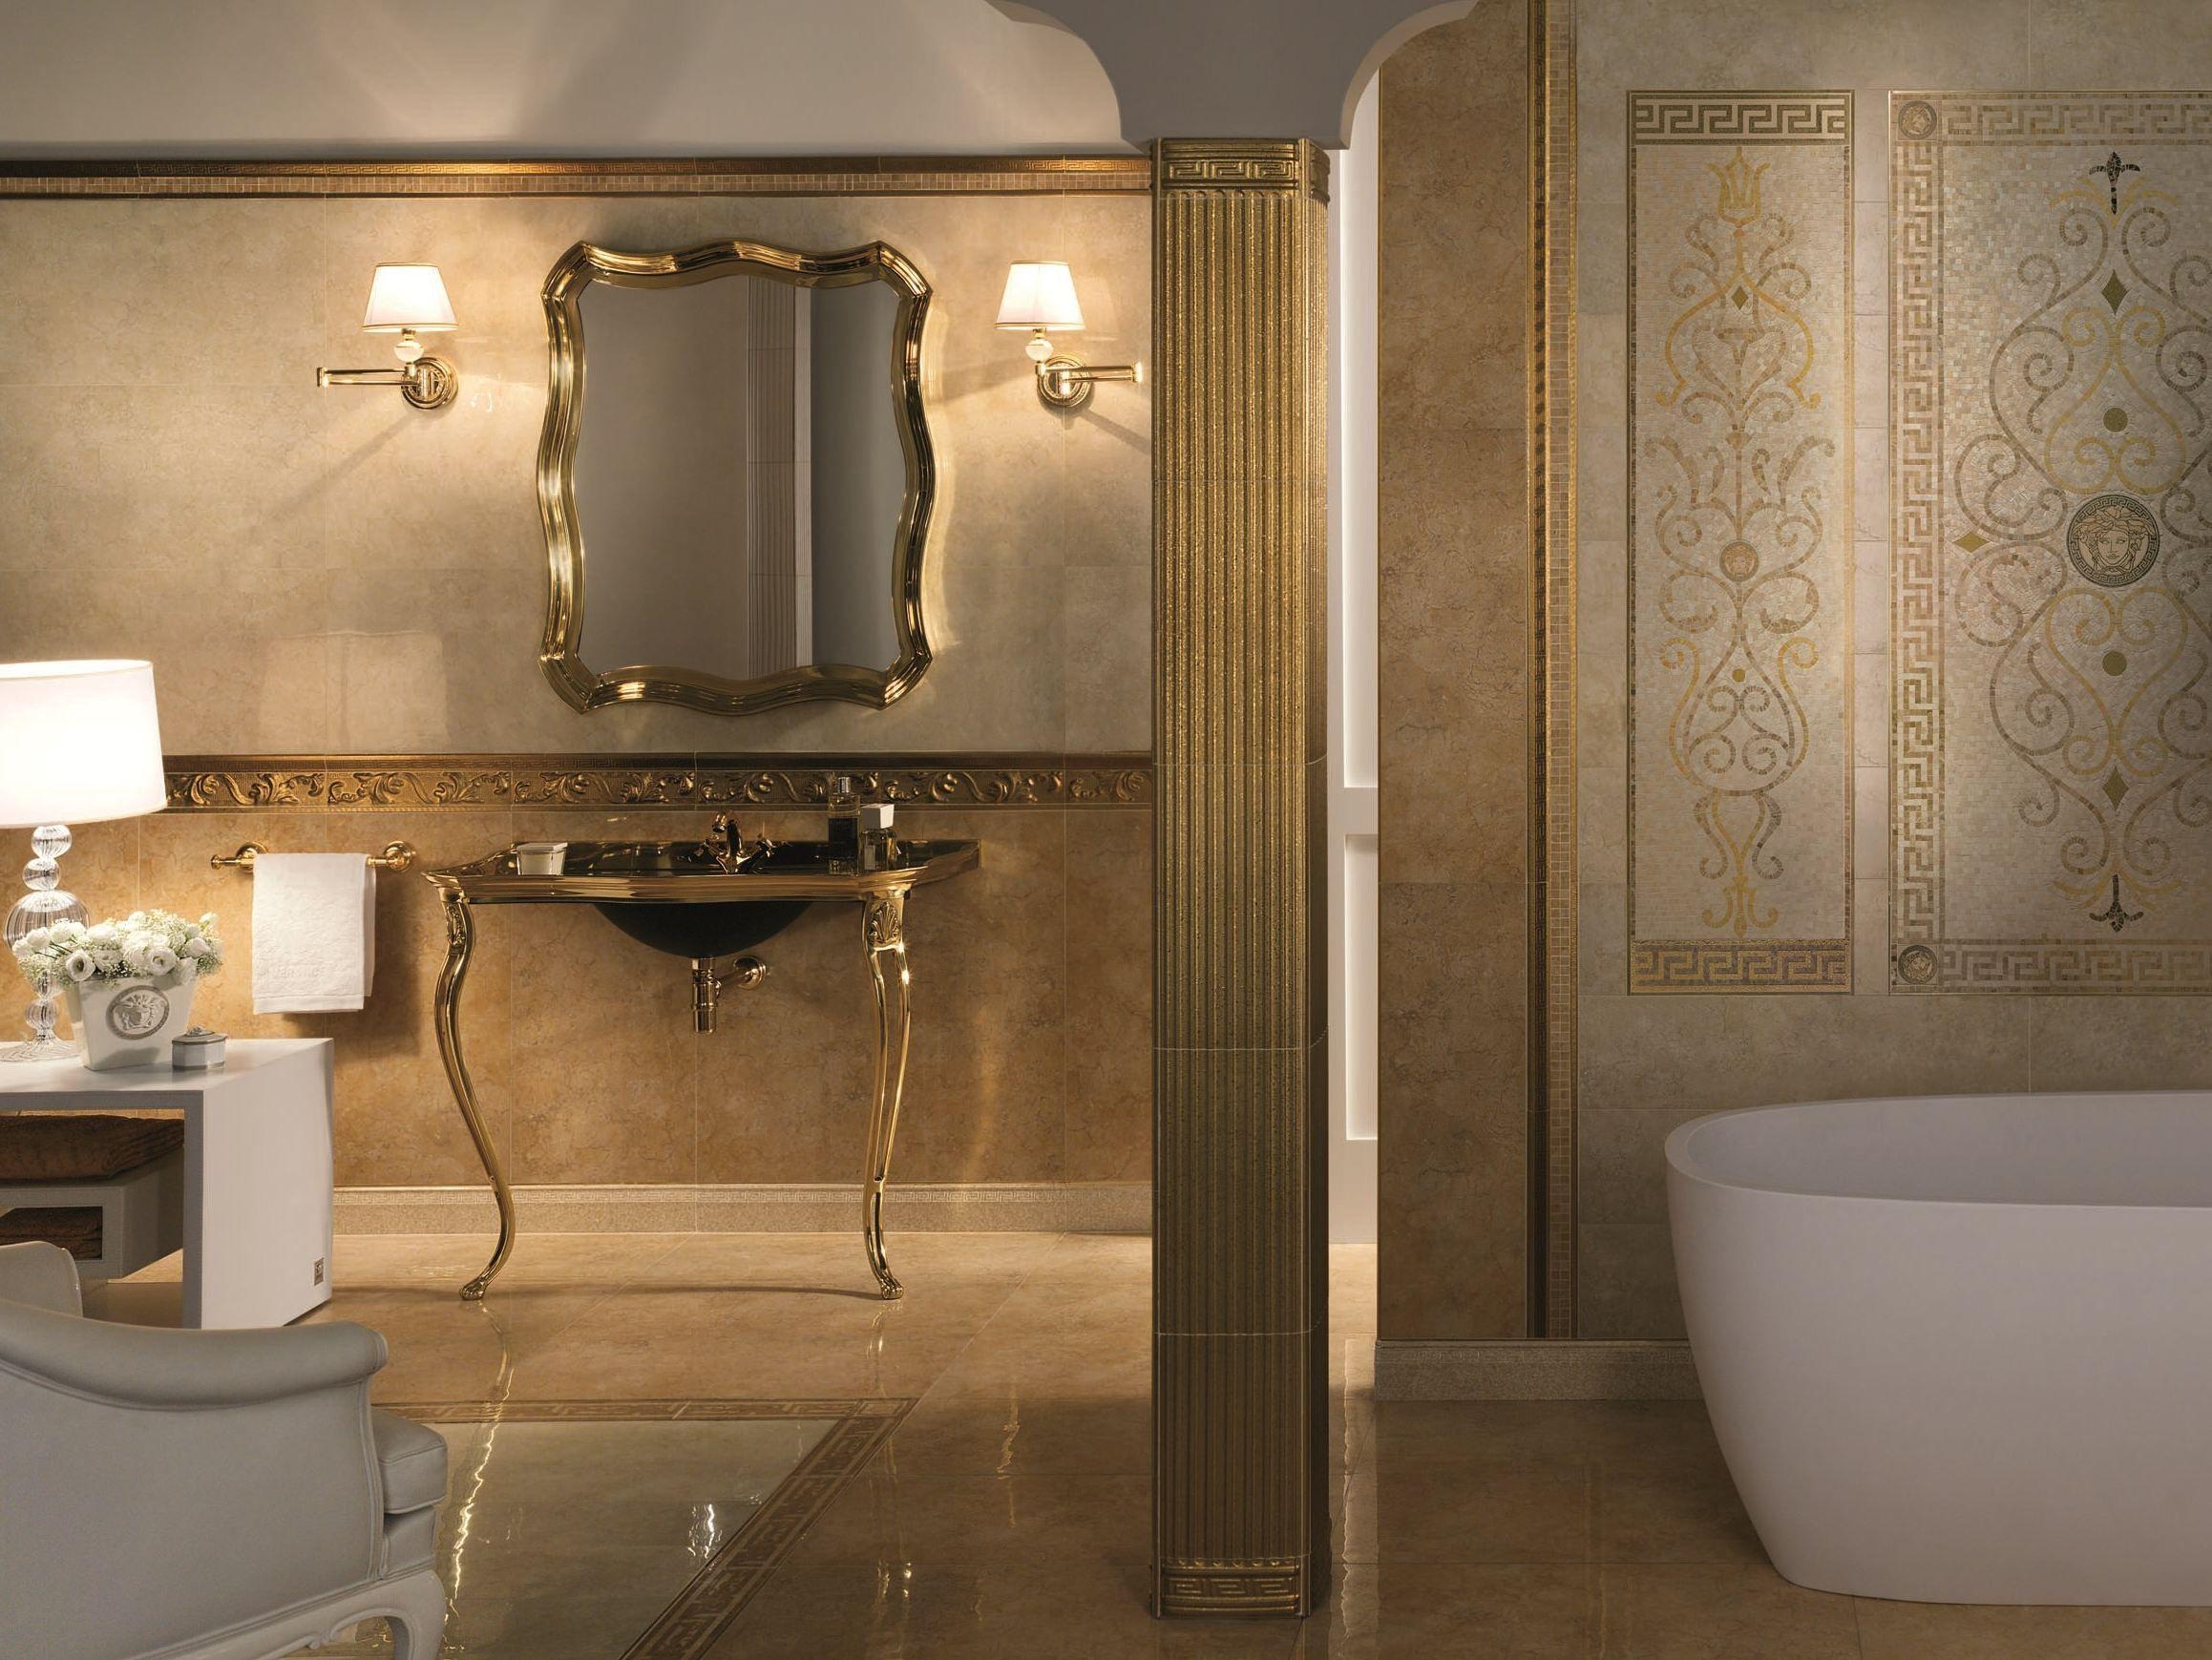 EXCLUSIVE by Versace Ceramics by Gardenia Orchidea